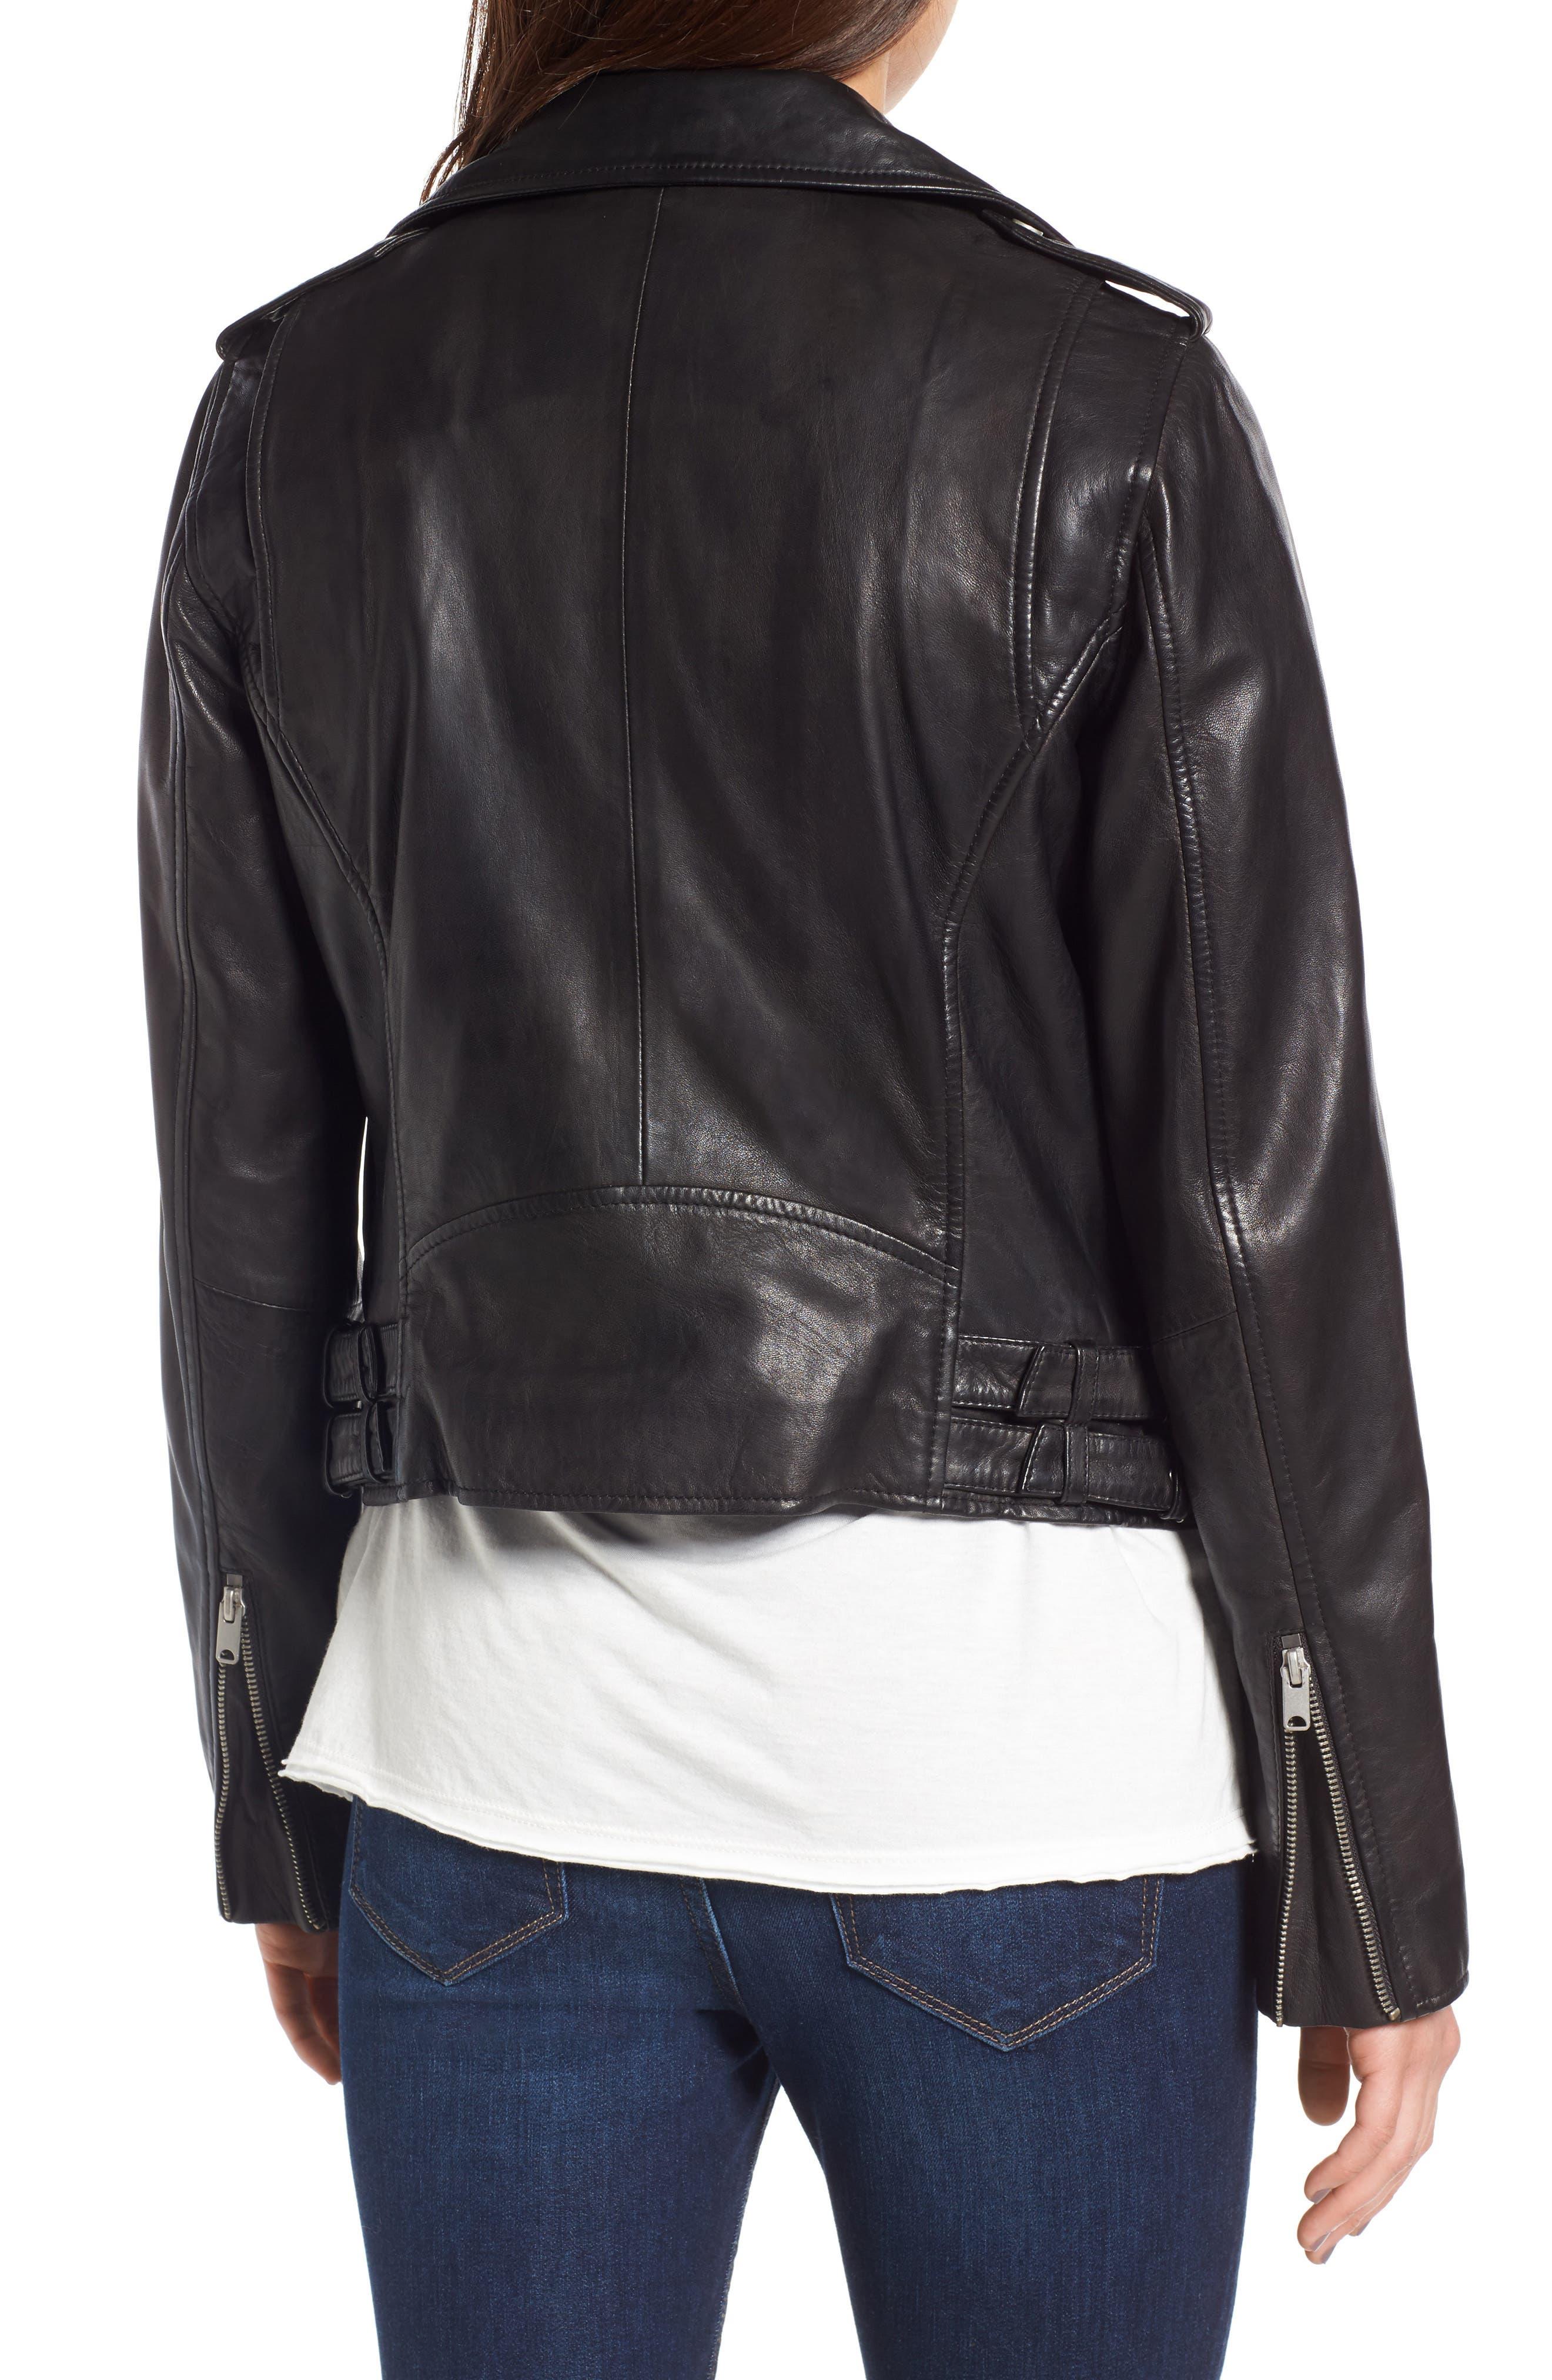 Andrew Marc Wesley Washed Leather Biker Jacket,                             Alternate thumbnail 2, color,                             001